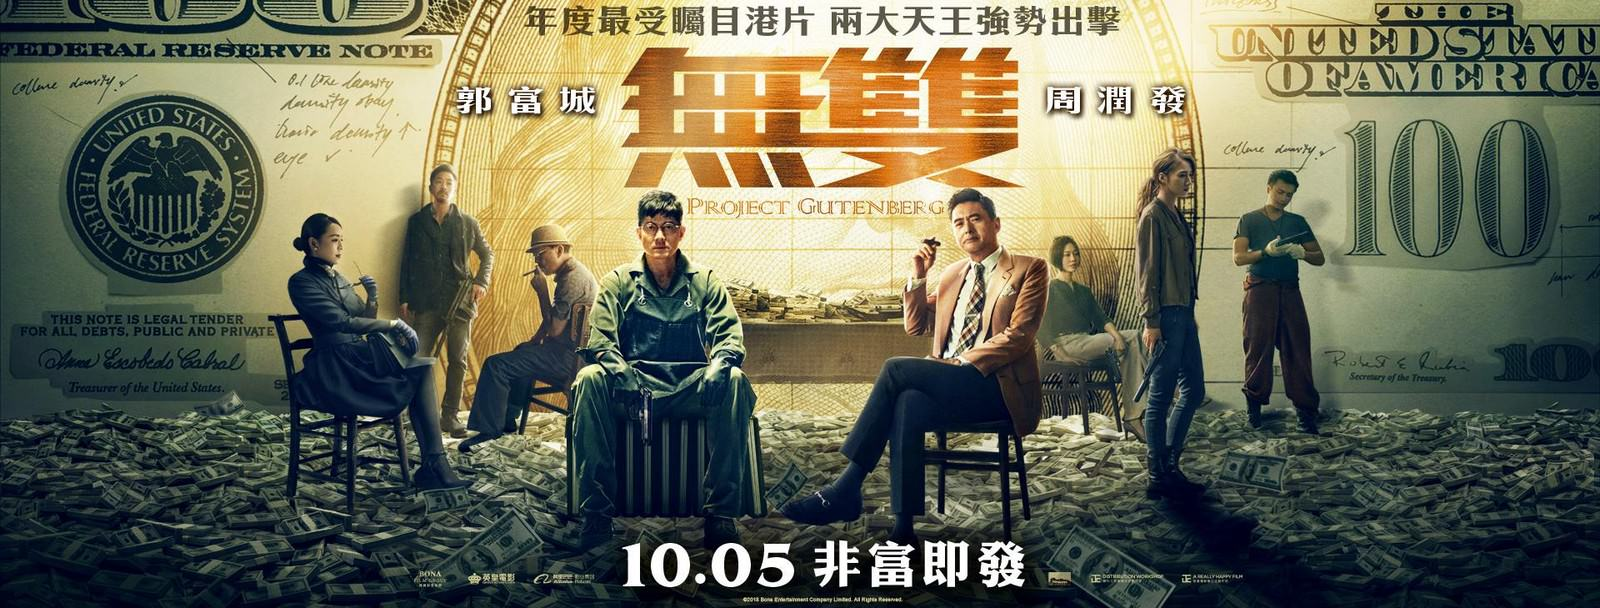 Movie, 無雙(中國.香港, 2018) / 無雙(台灣) / 无双(中國) / Project Gutenberg(英文), 電影海報, 台灣, 橫版